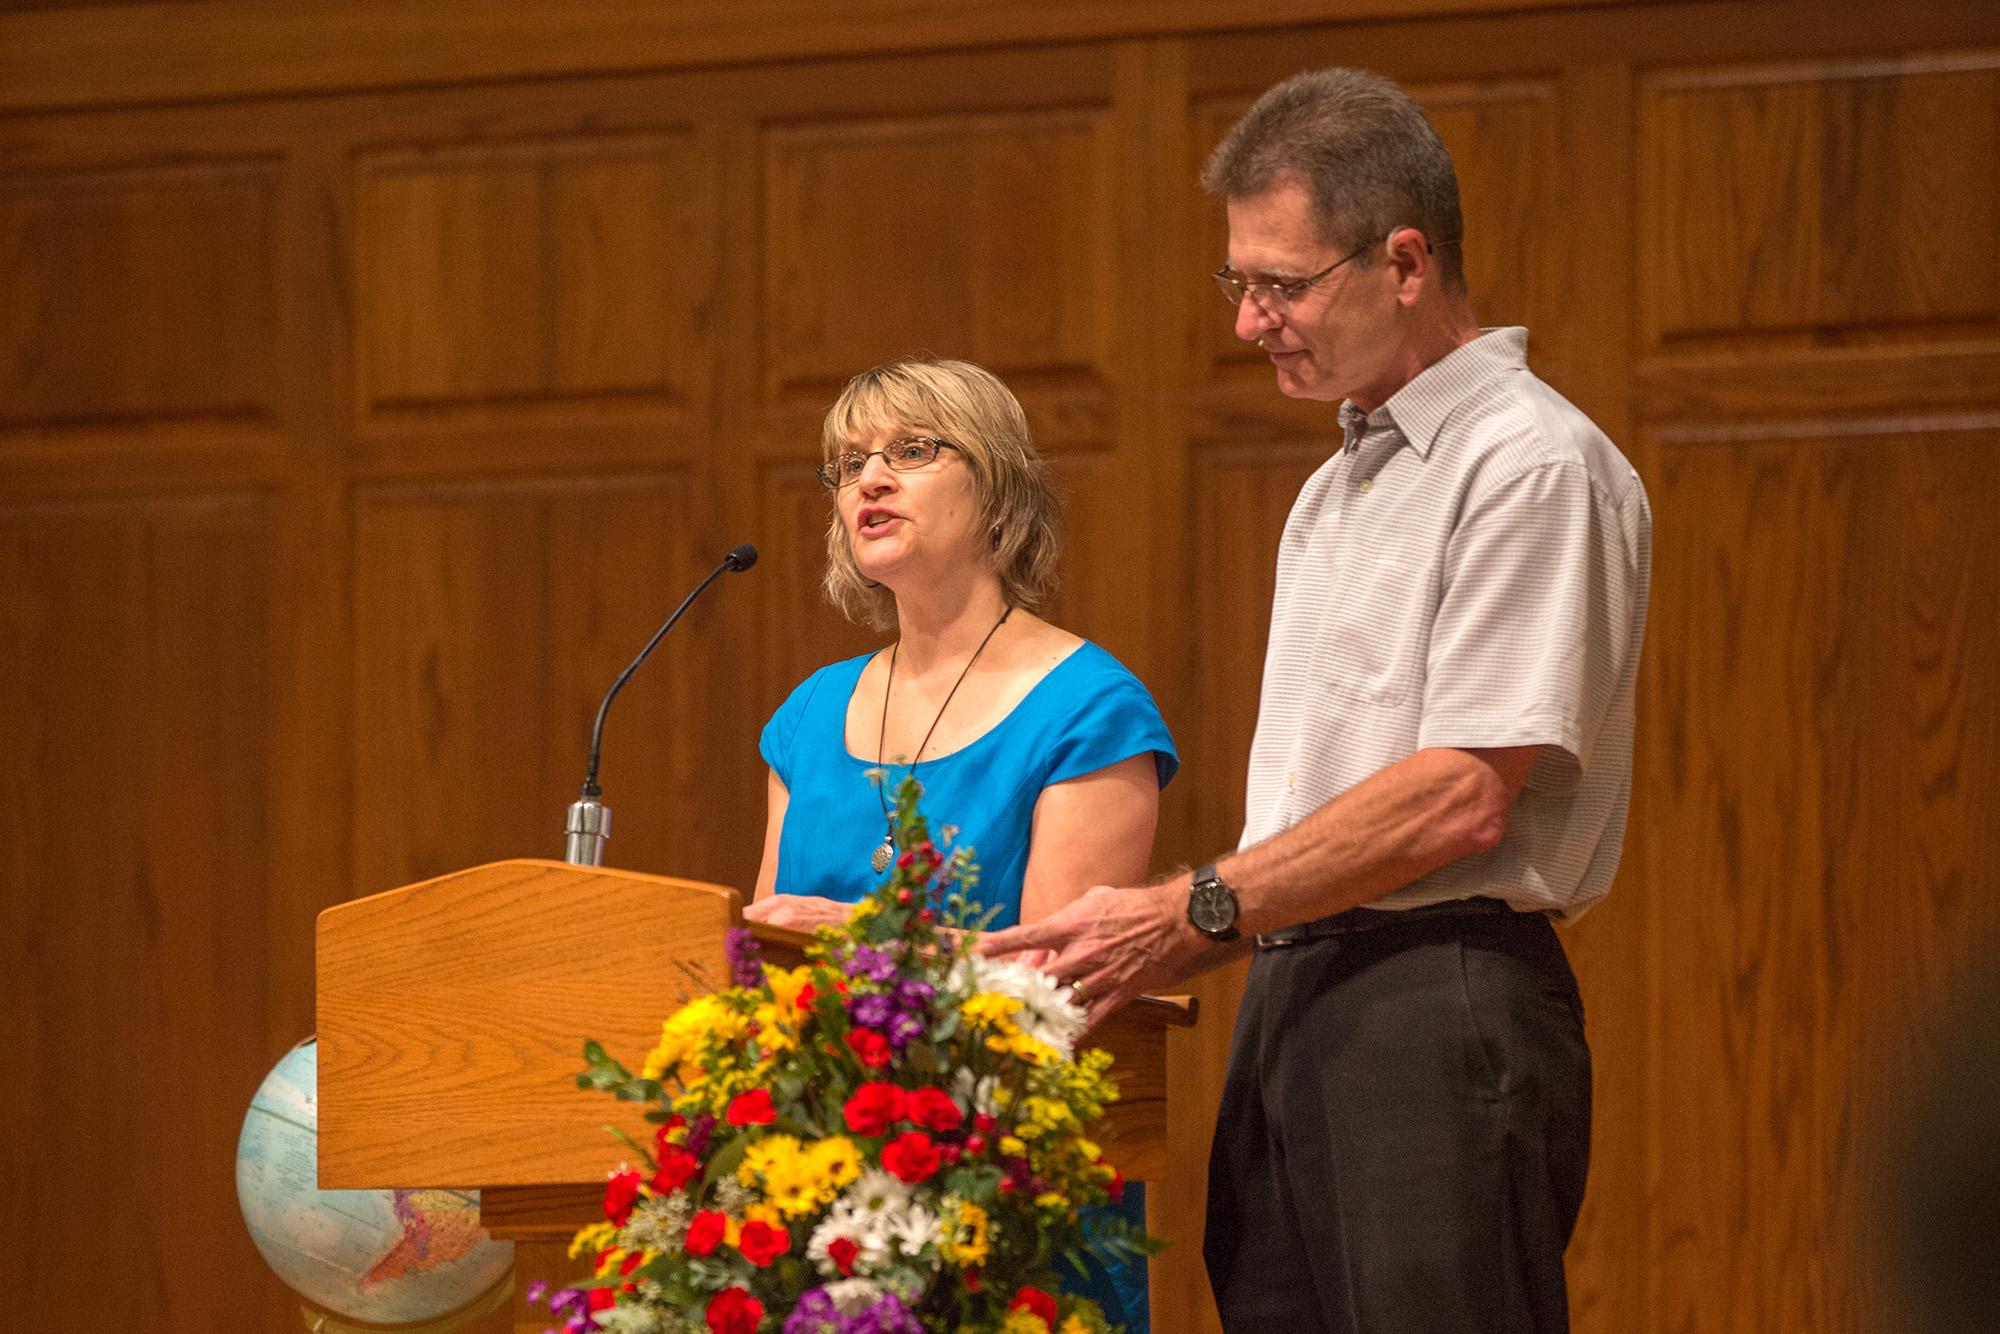 Kathy Keener Shantz and Stan Shantz preach at the Homecoming Weekend Worship Service.